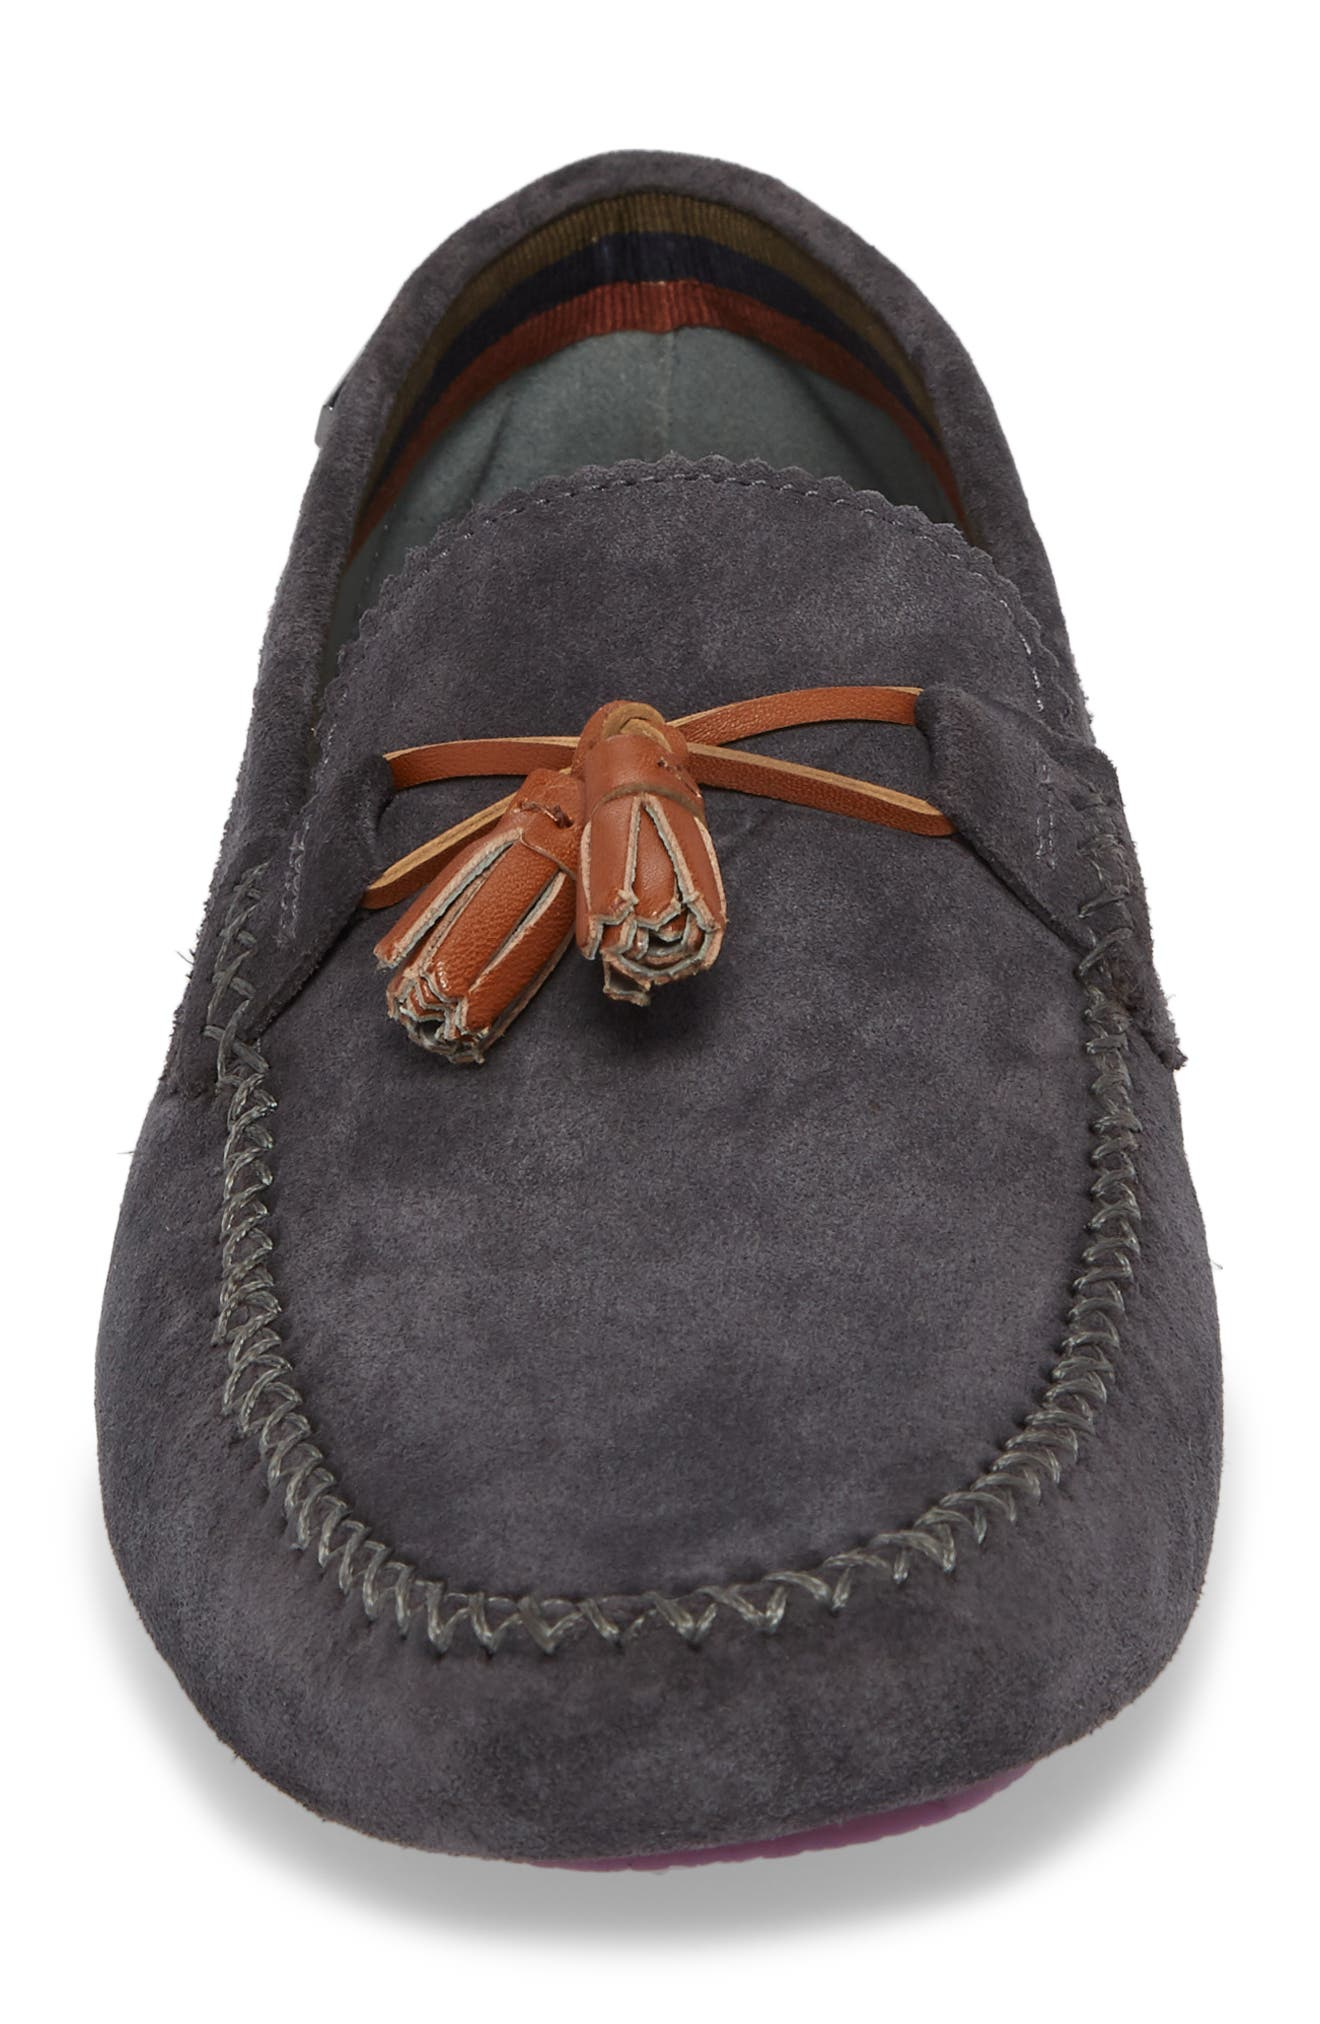 Urbonns Tasseled Driving Loafer,                             Alternate thumbnail 4, color,                             070